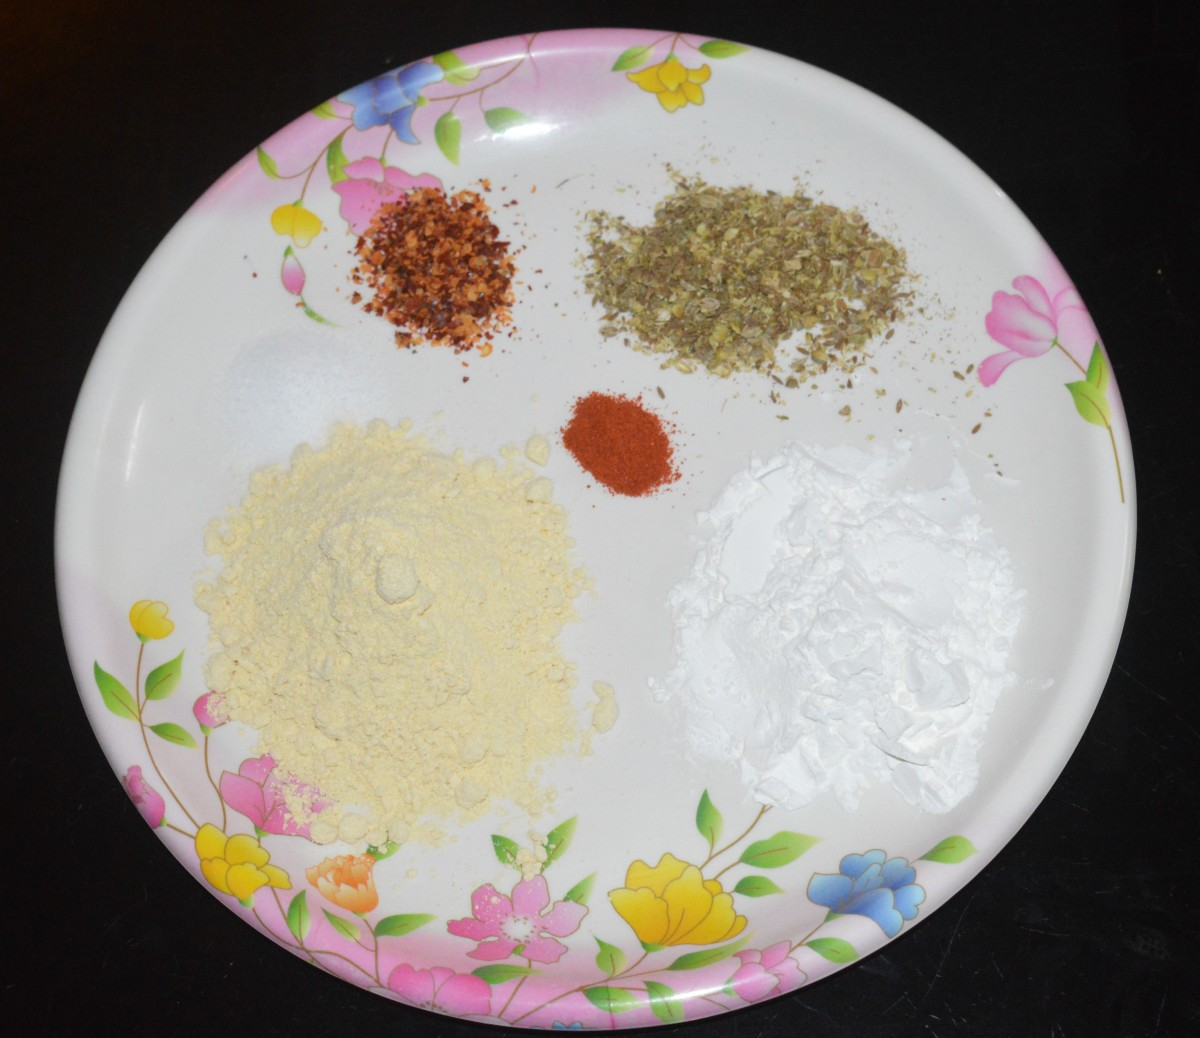 Add gram flour, cornflour, crushed cumin-coriander seeds, chili flakes, red chili powder, and salt.